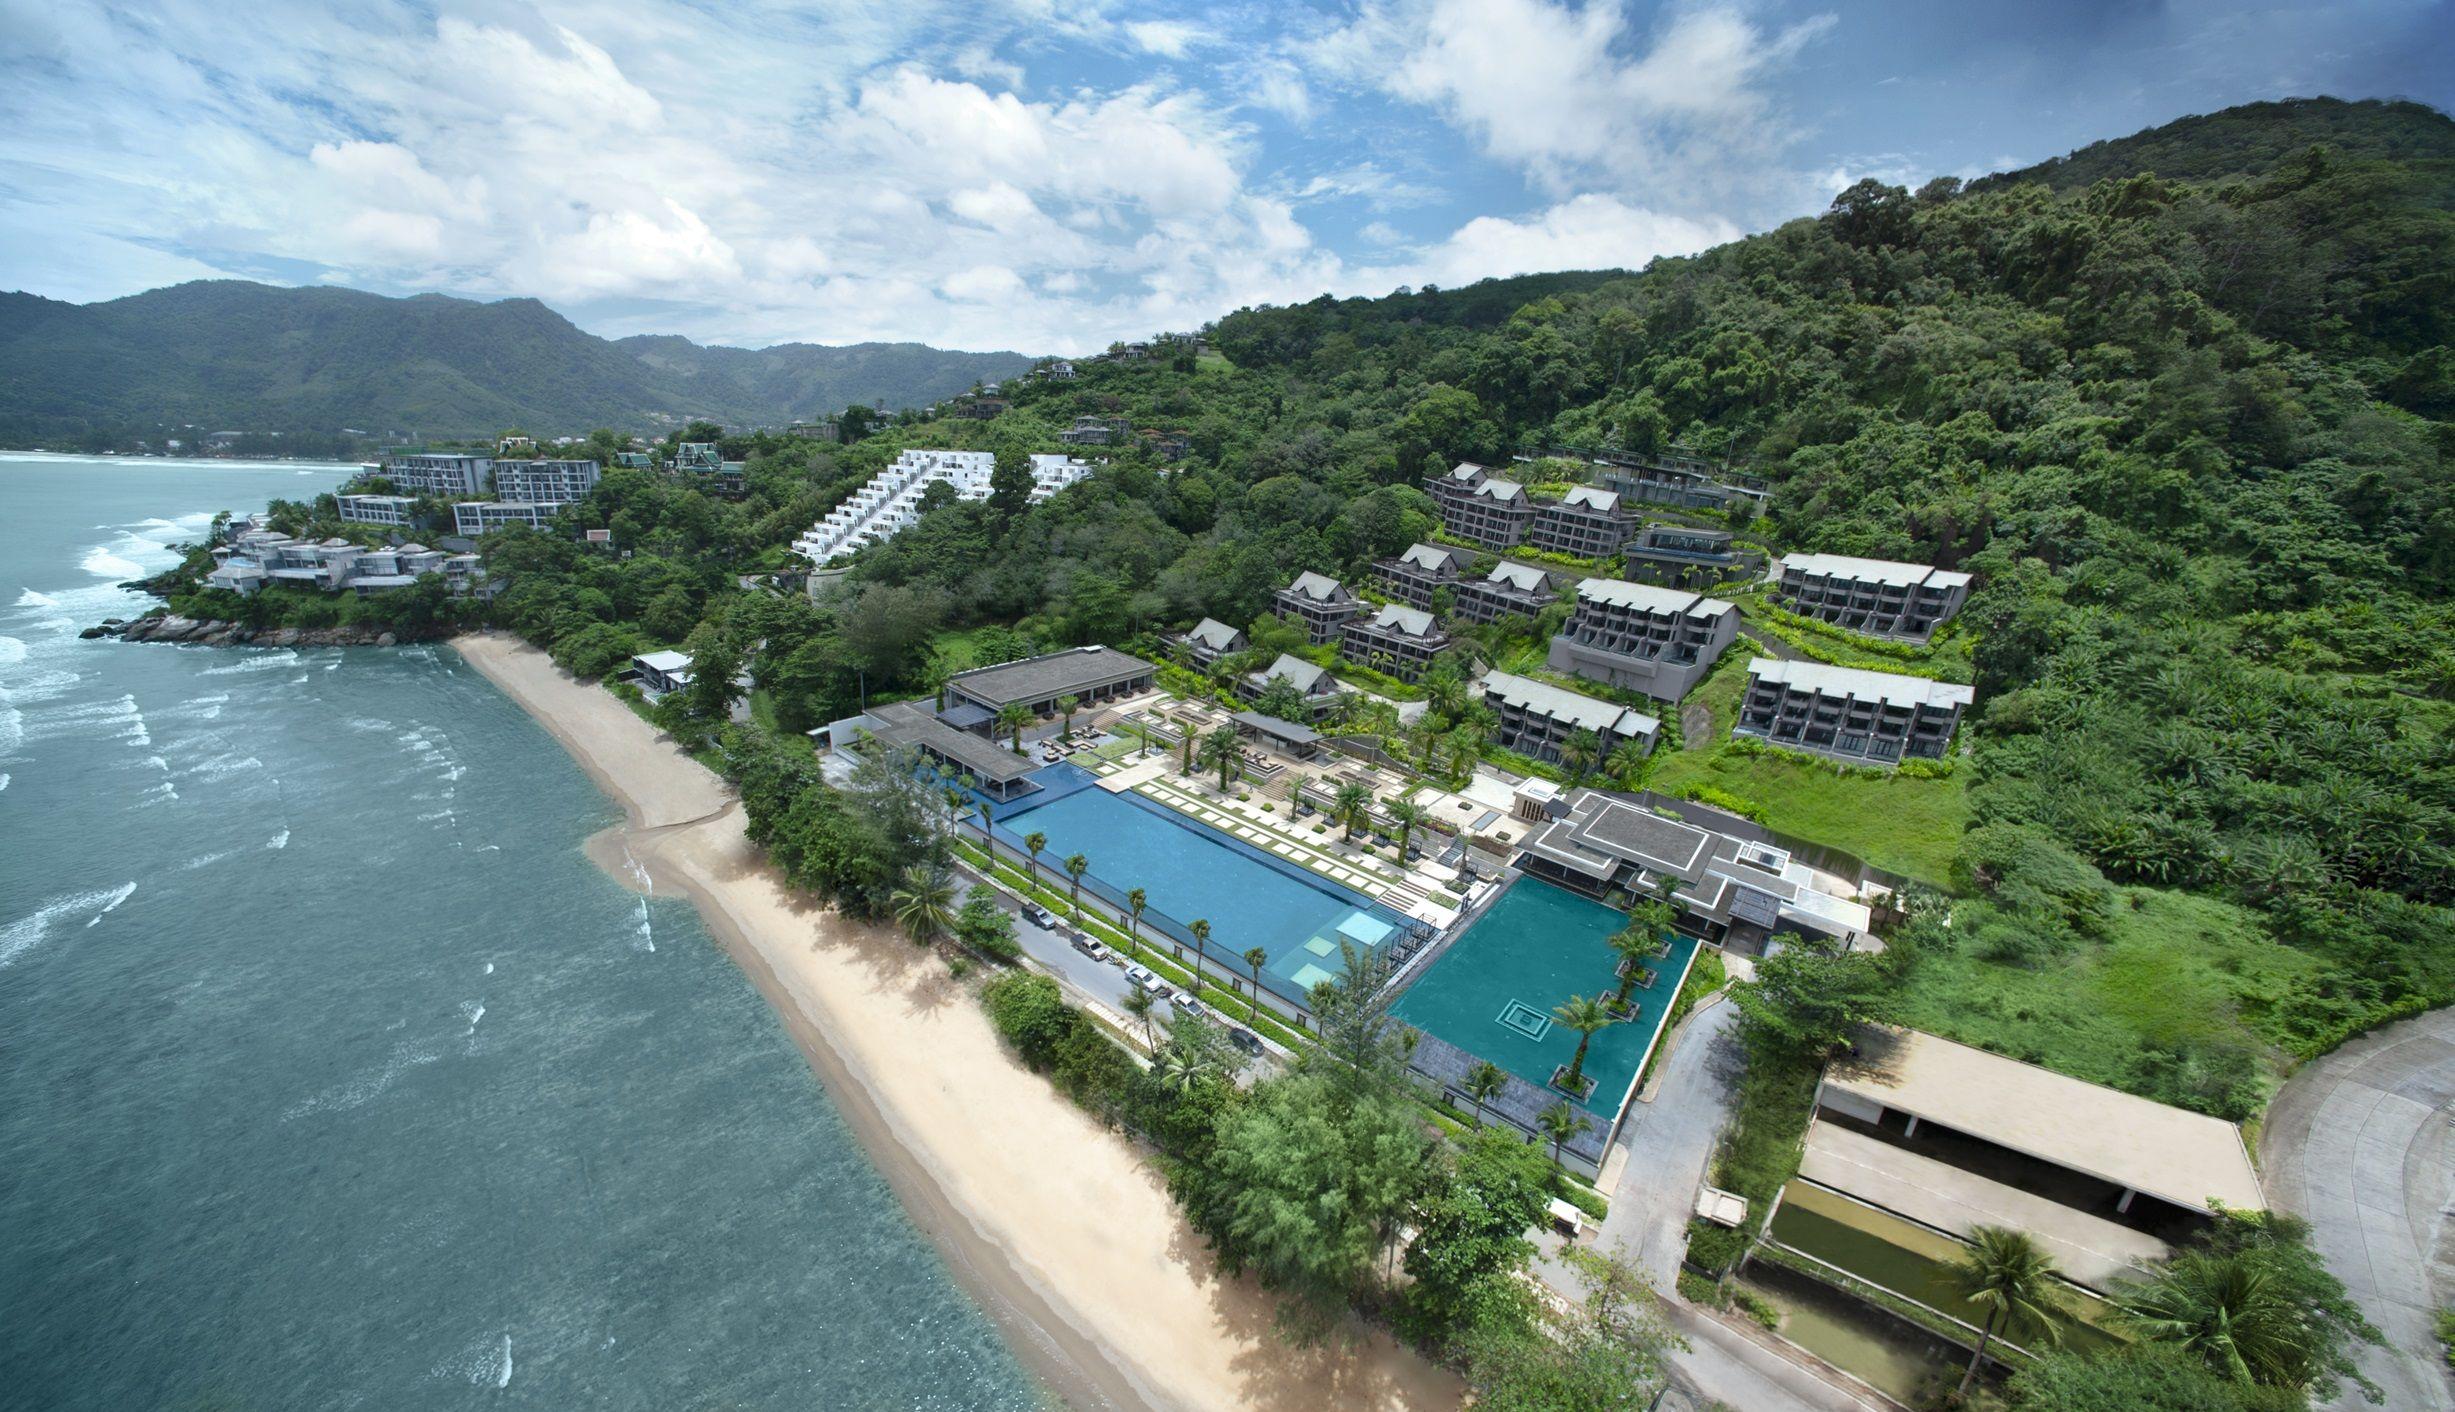 Aerial Shot - Hyatt Regency Phuket - daylight | Hyatt Regency Phuket ...